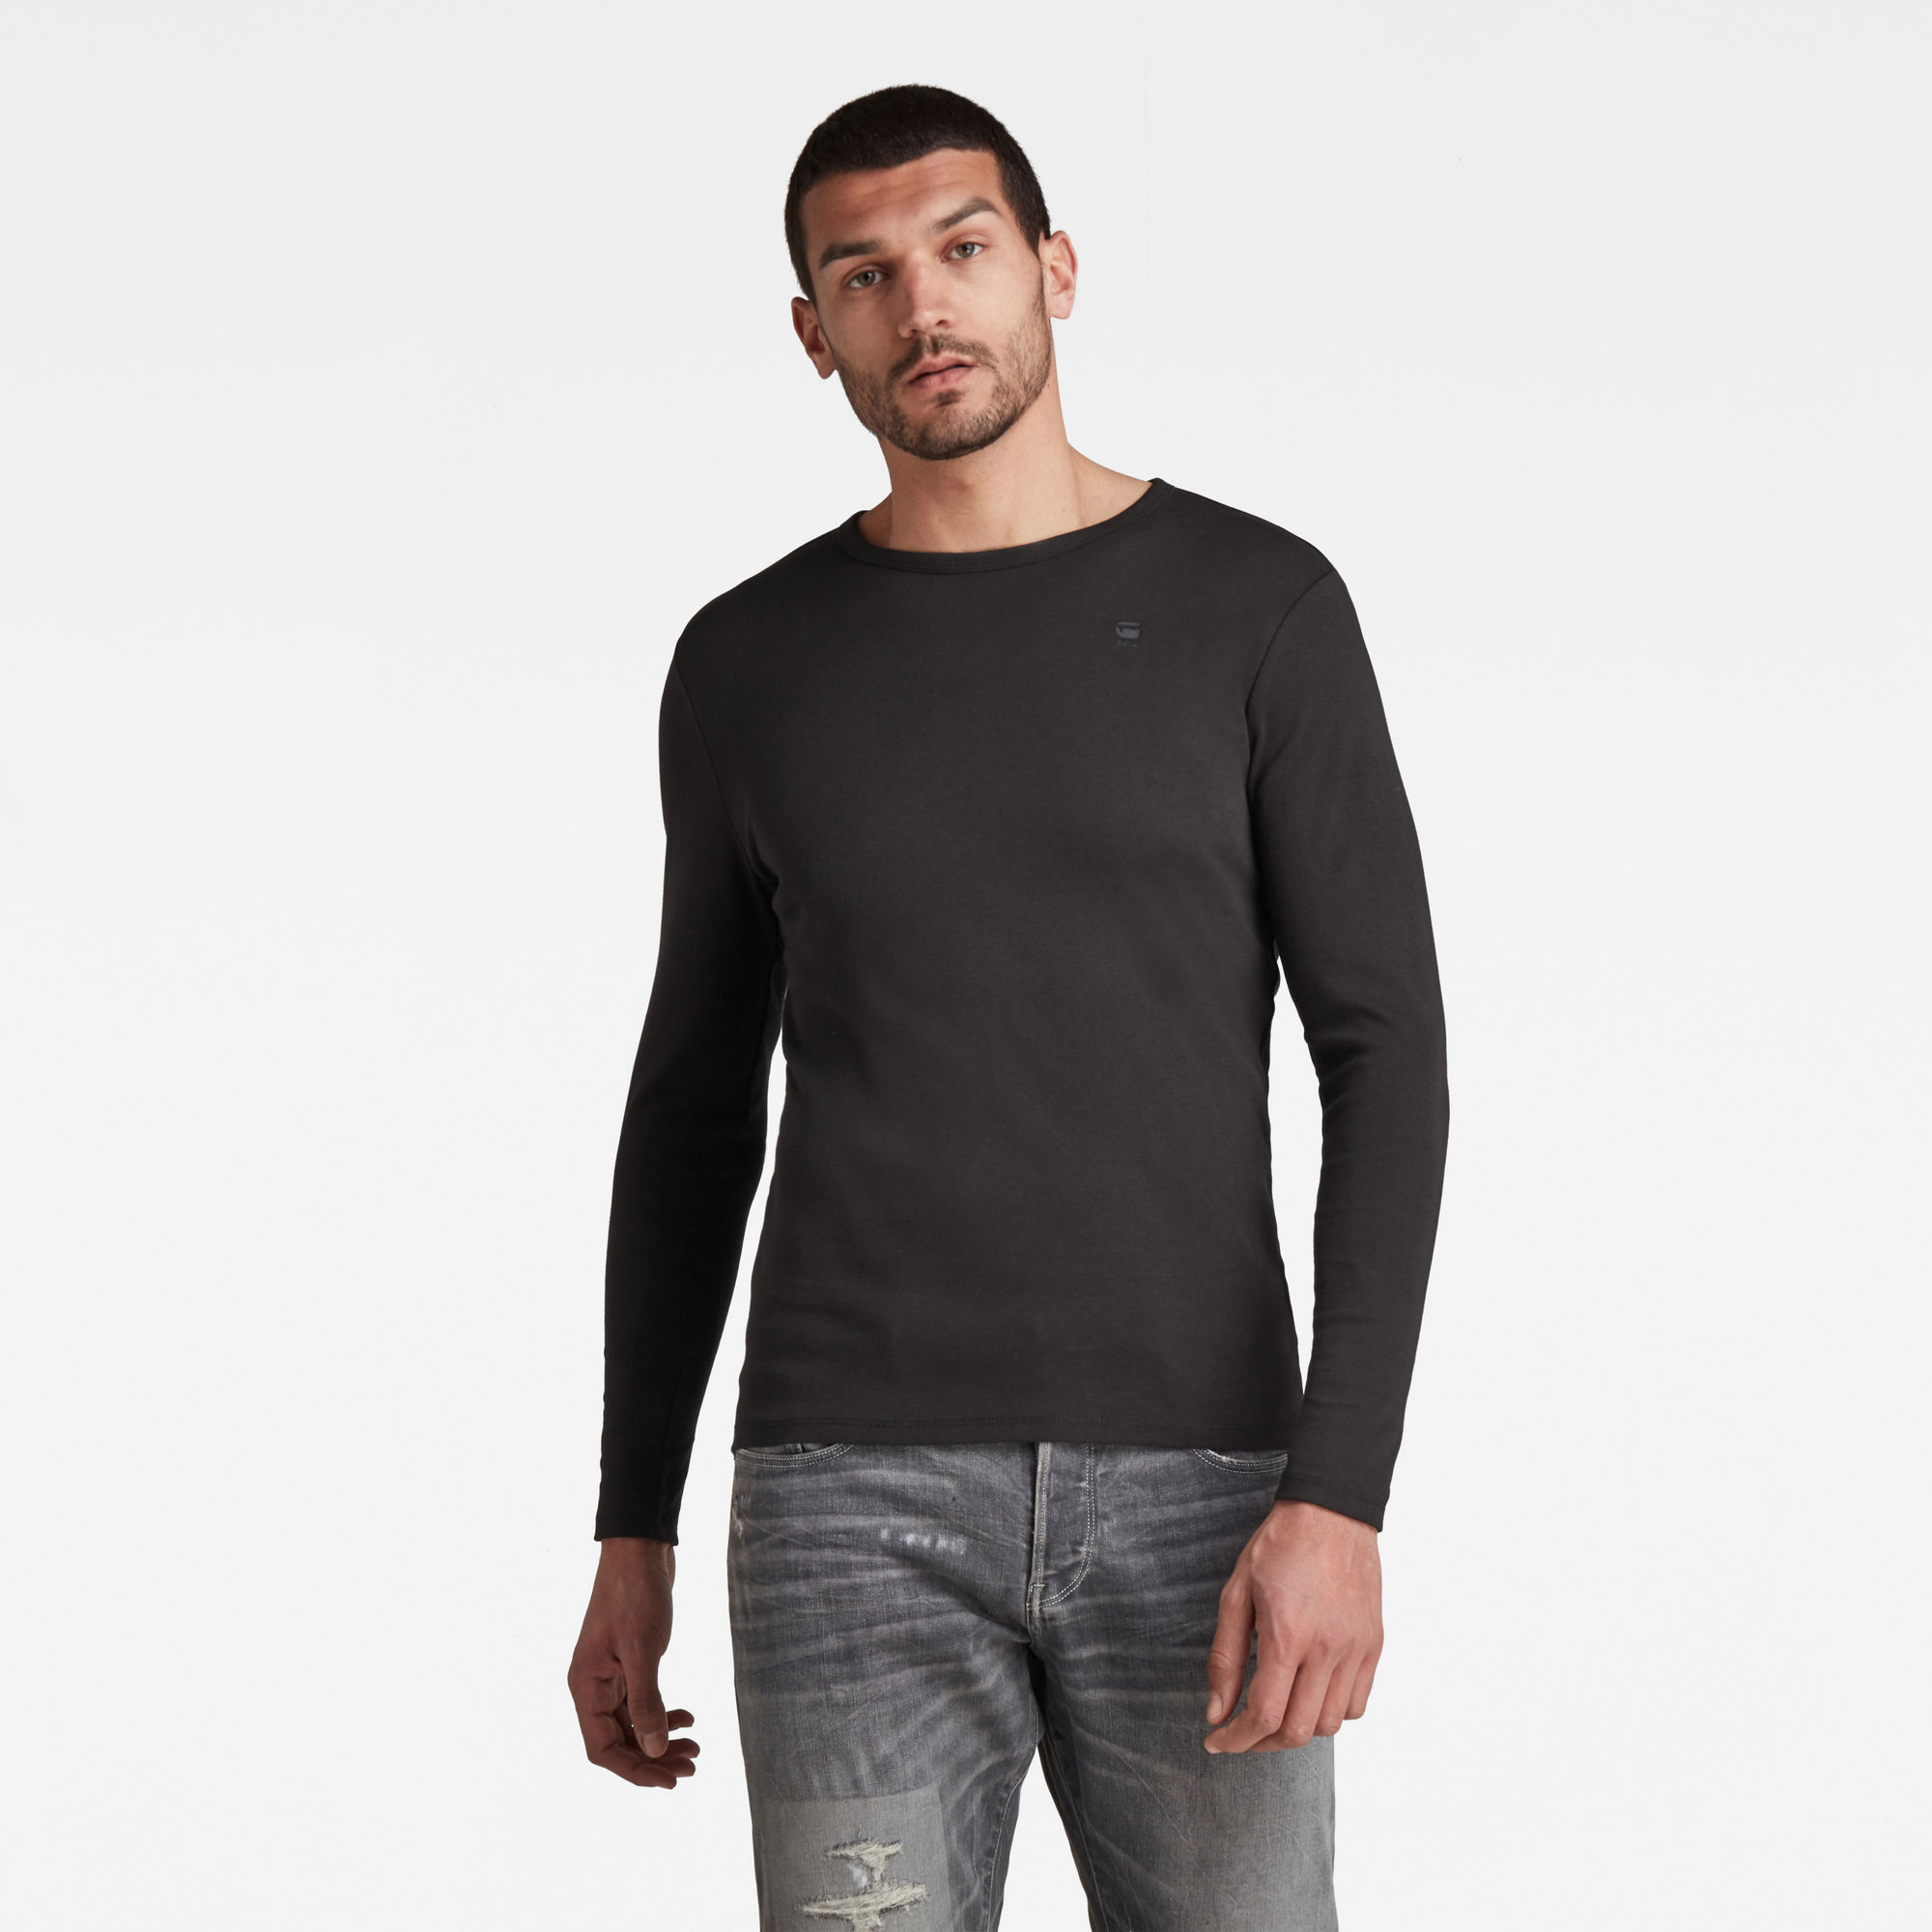 G Star Raw Base Round Neck Long Sleeve T-Shirt